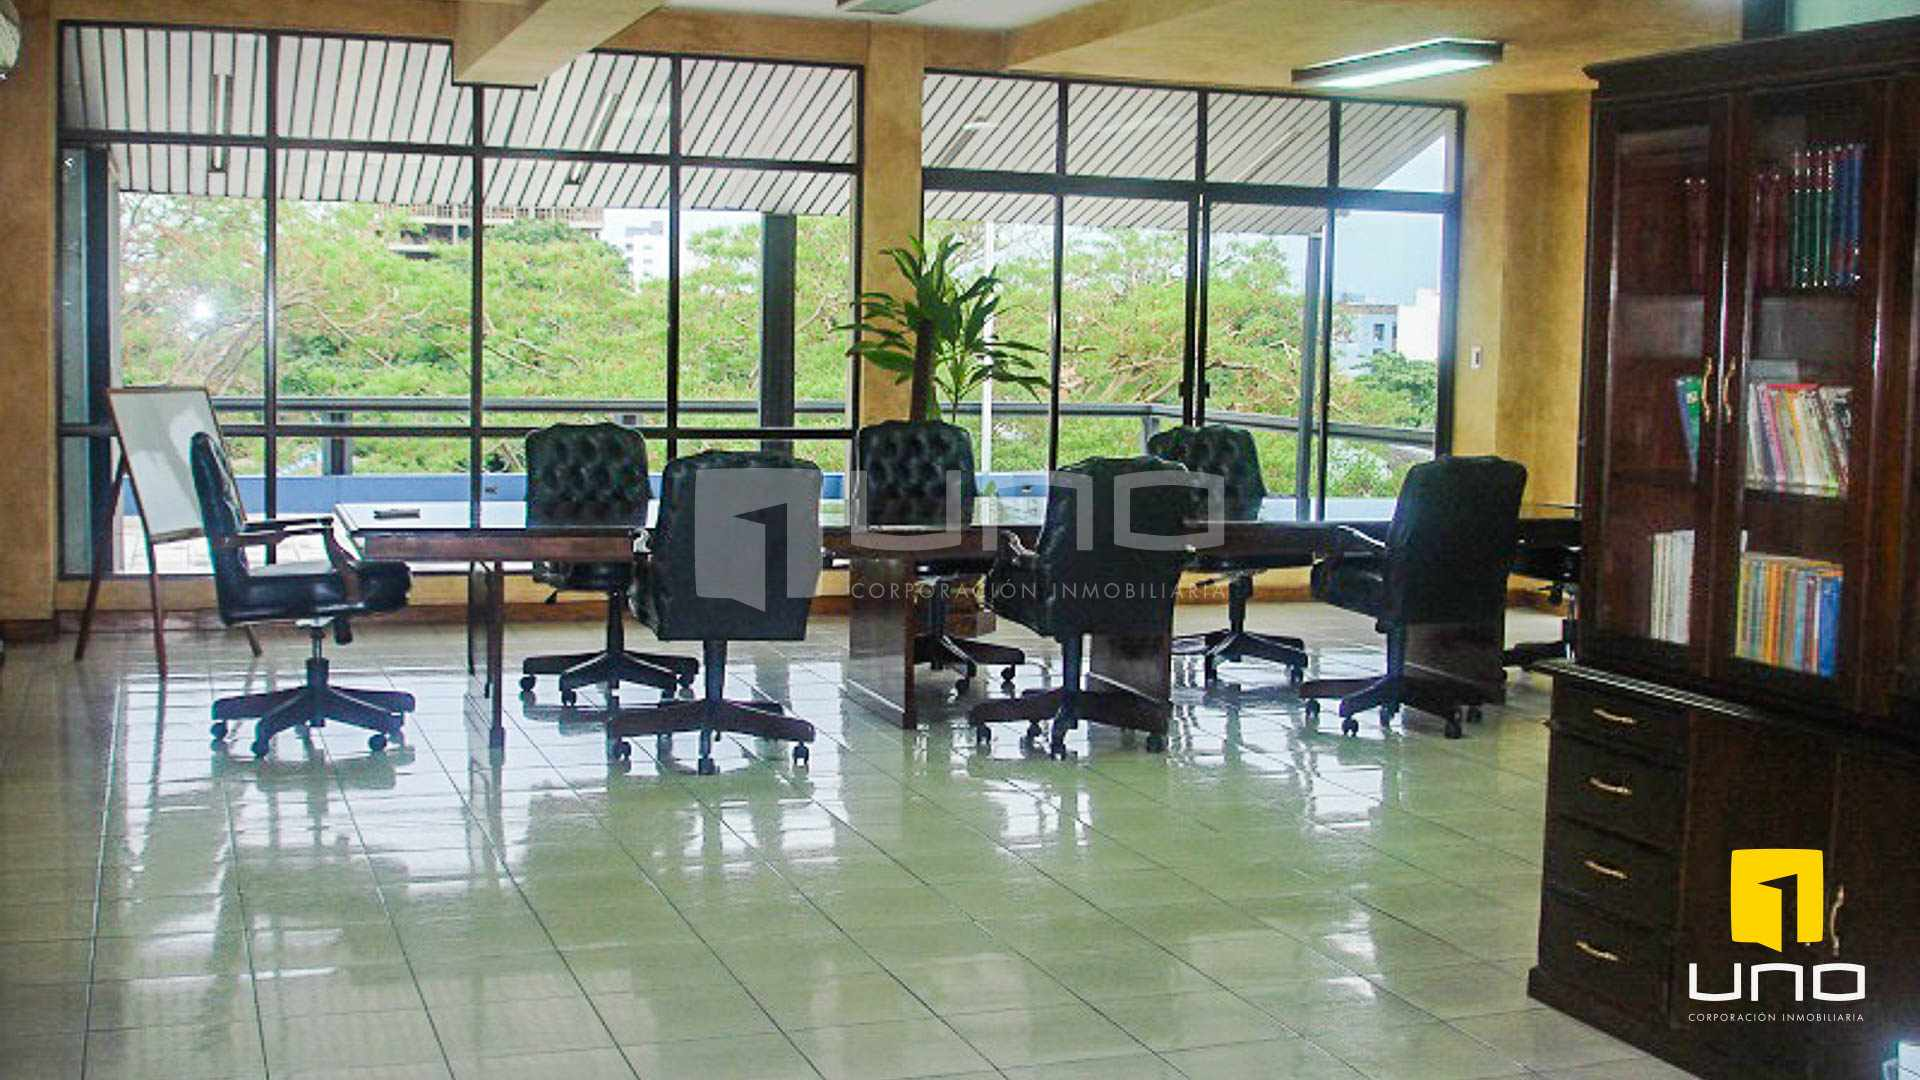 Oficina en Venta REGALO OFICINA SOBRE AV. IRALA EN PRIMER PISO Foto 2